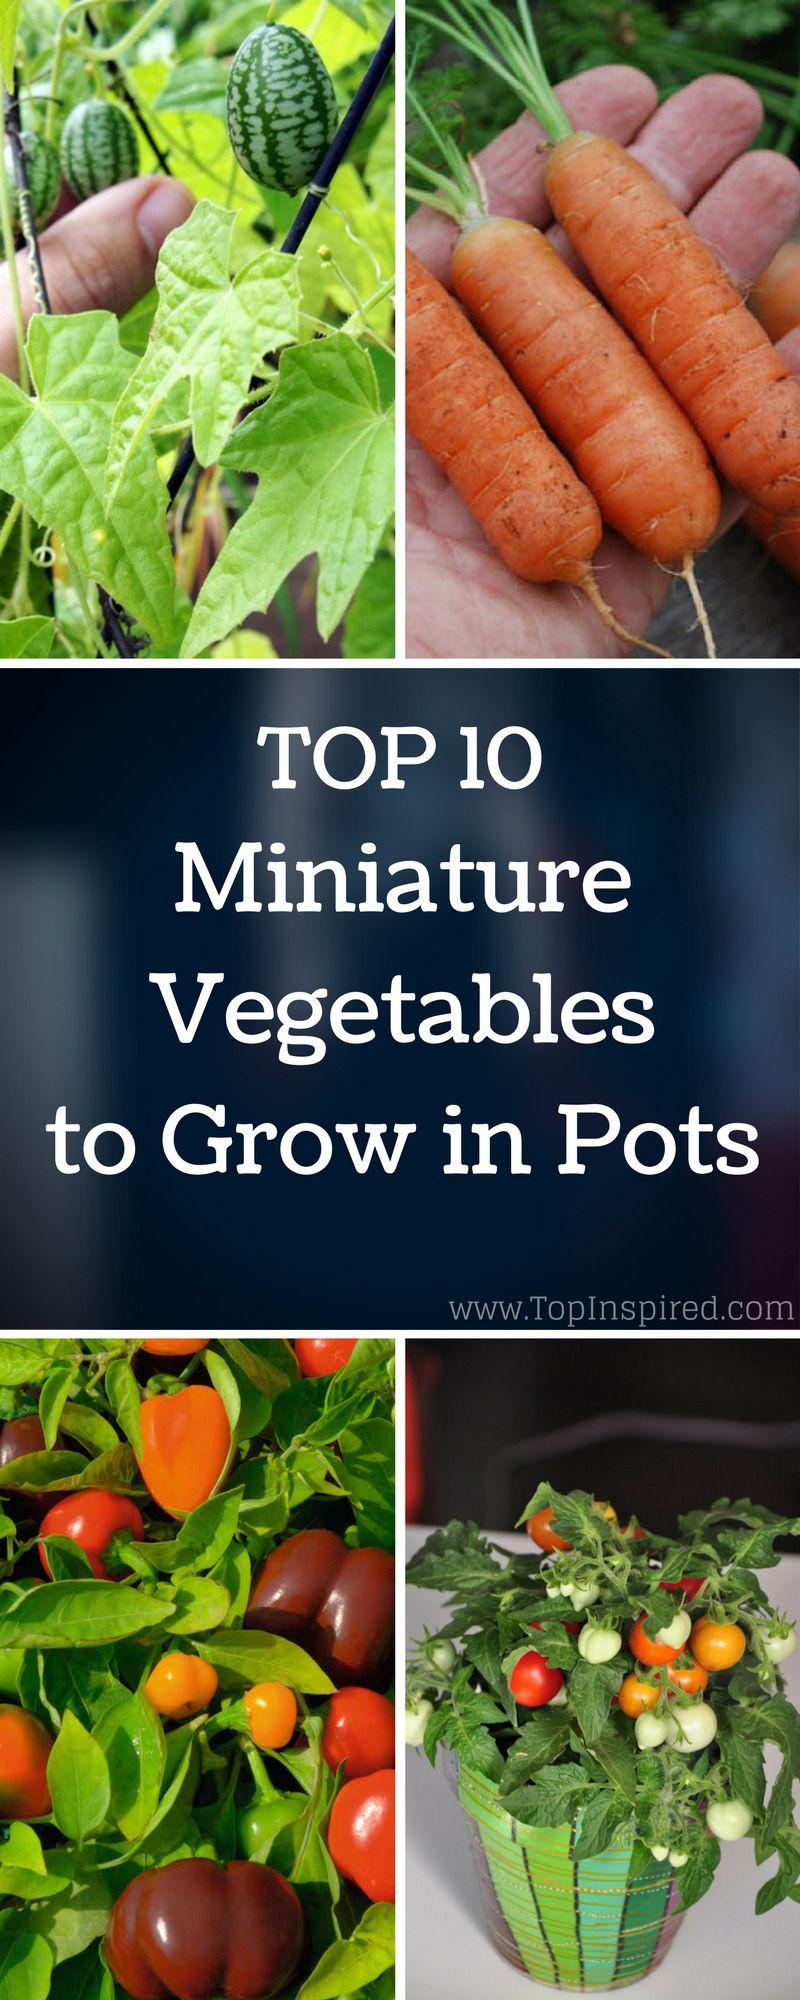 Top 10 Miniature Vegetables To Grow In Pots Growing 640 x 480